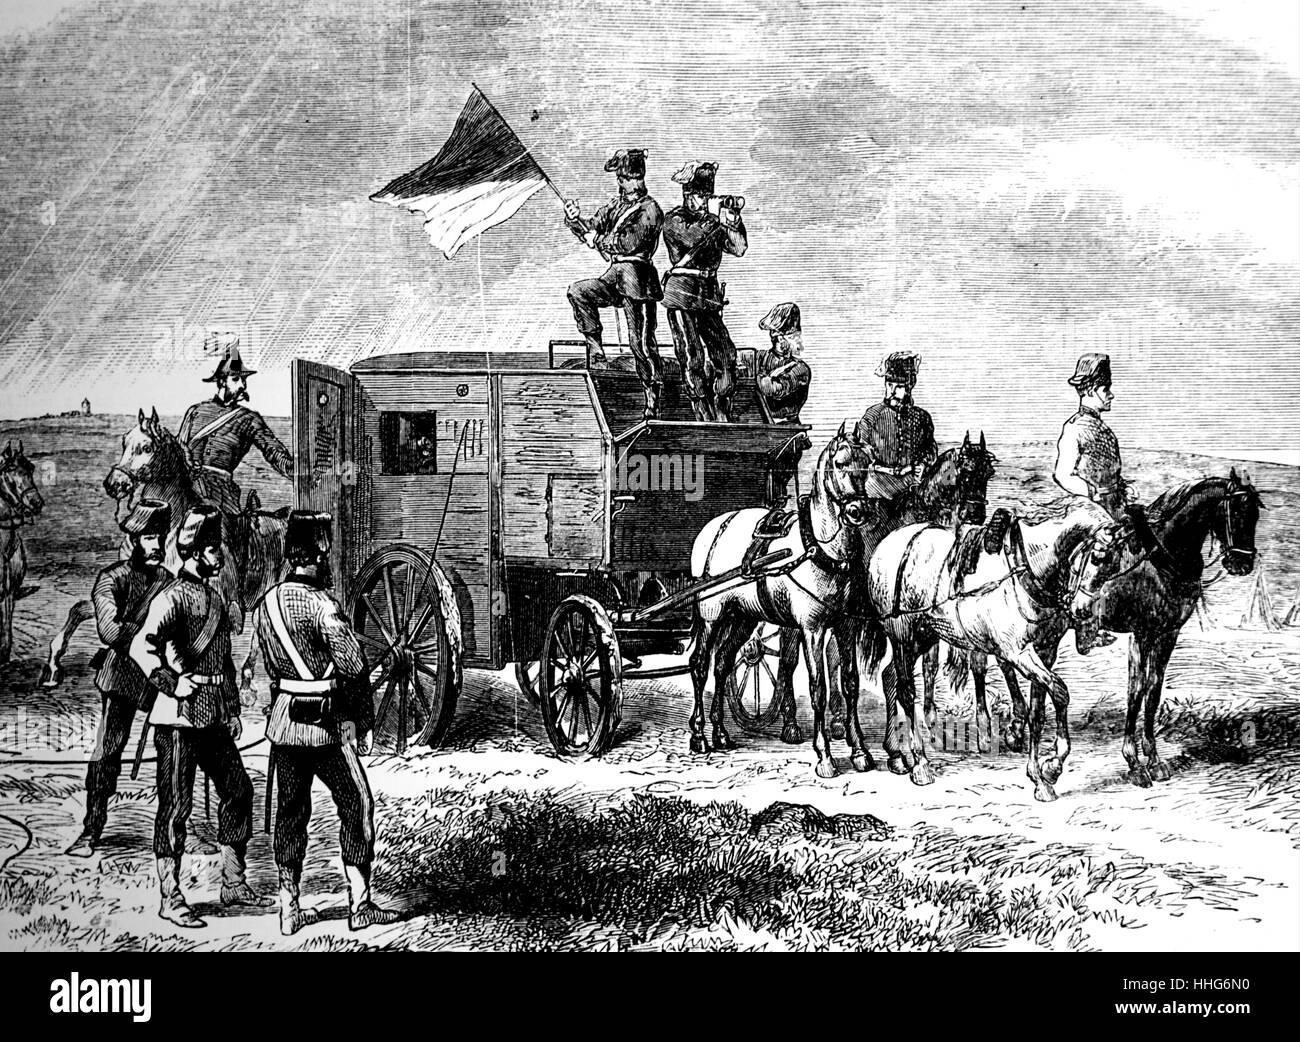 Field telegraph corps; Royal Engineers. Field telegraph headquarters van. 1869. - Stock Image